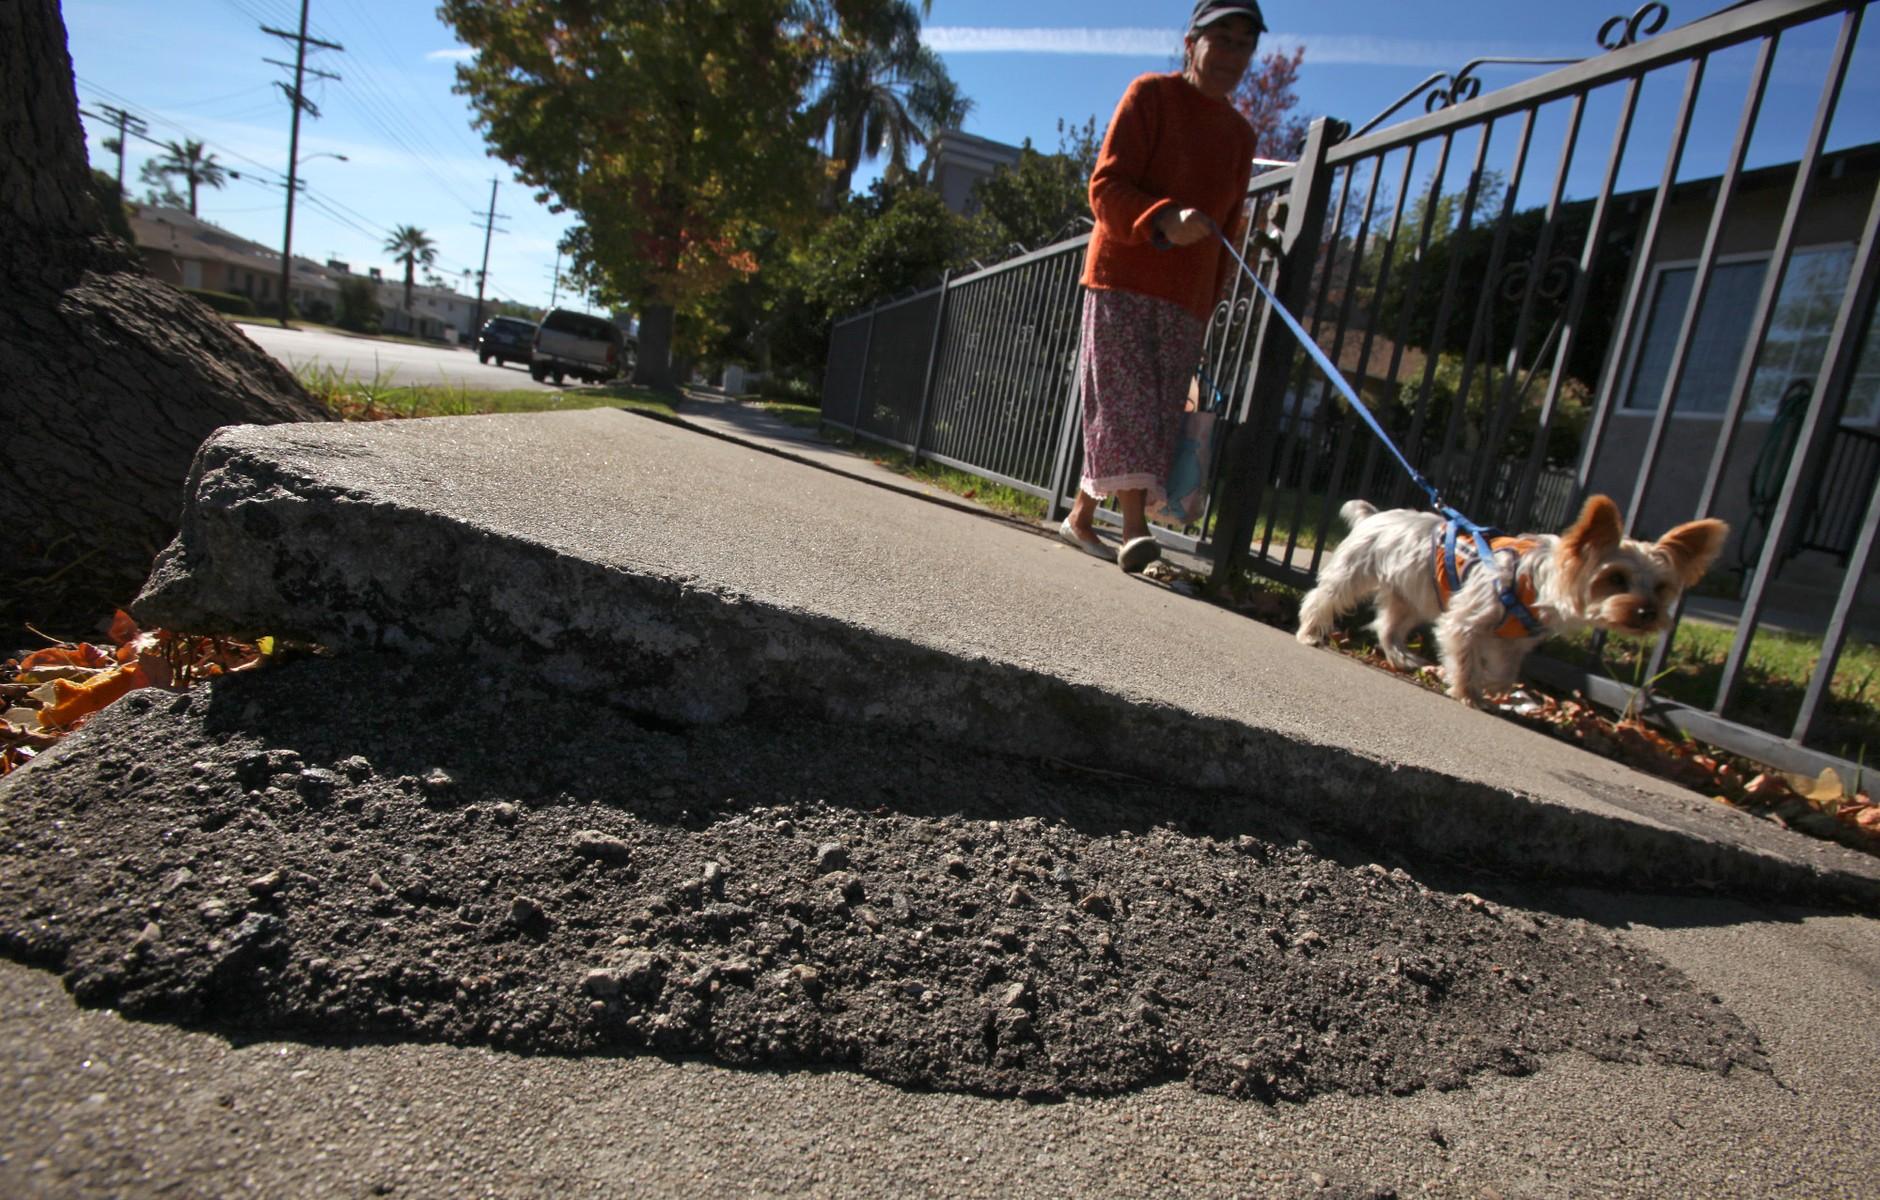 The High Cost of Bad Sidewalks